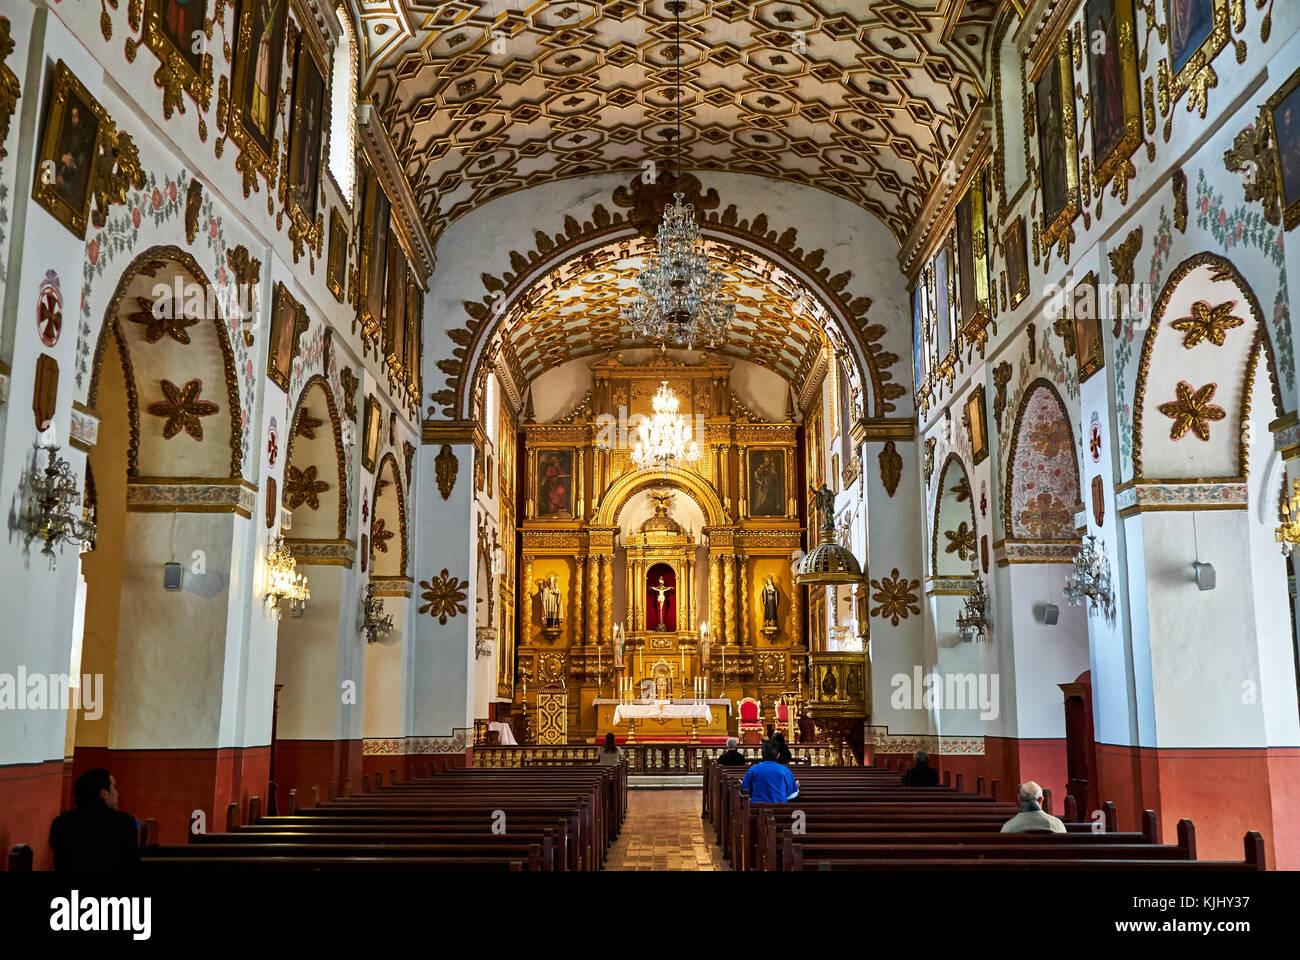 interior shot of Iglesia San Agustin, Bogota, Colombia, South America - Stock Image